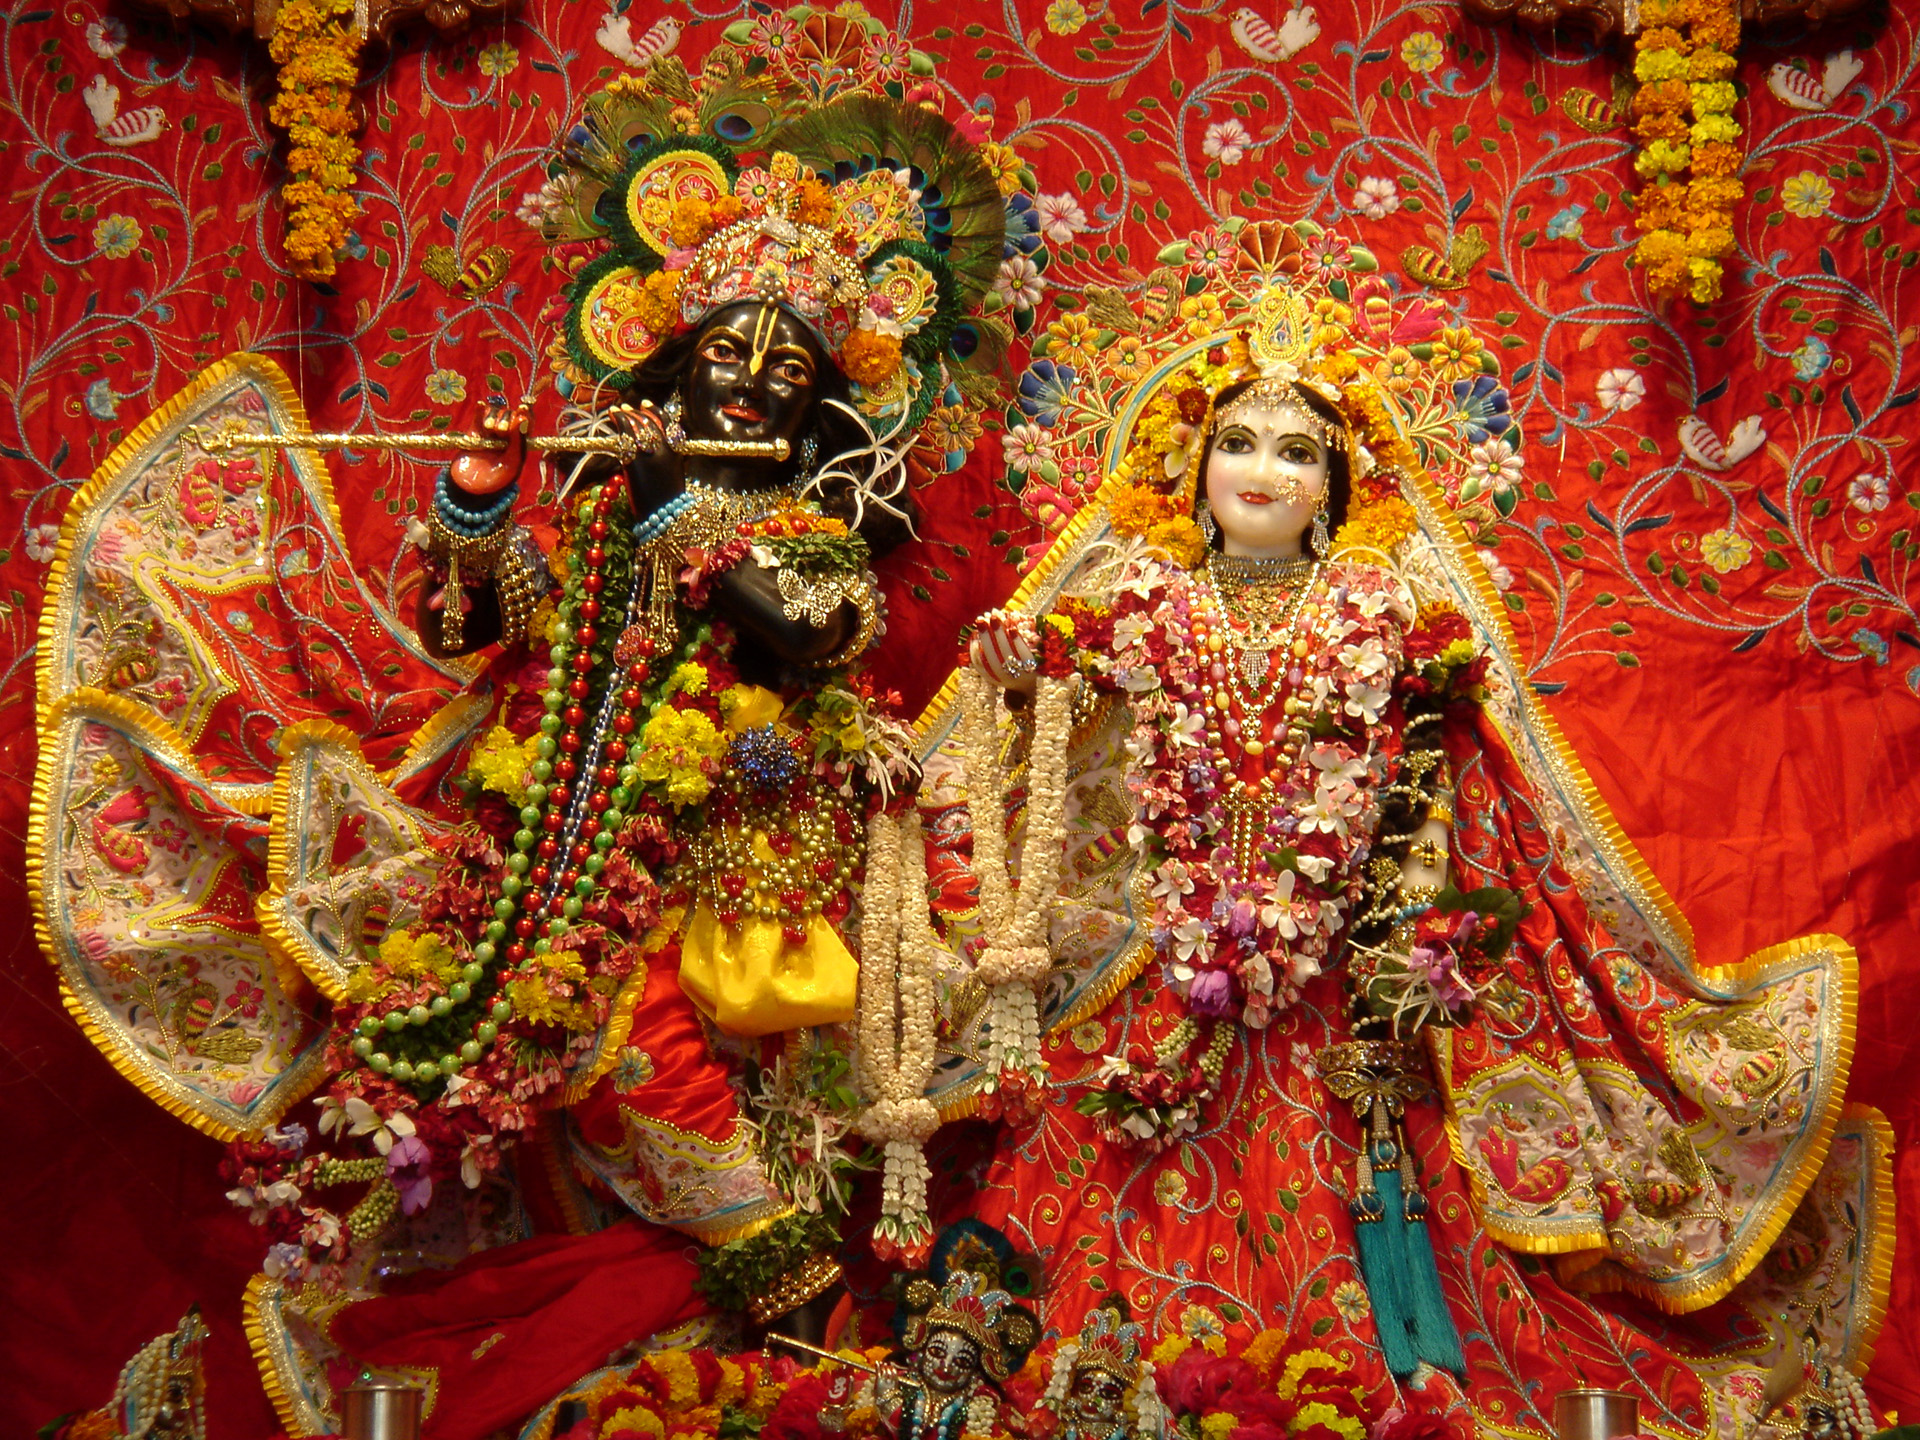 PunjabKesari, Sri krishan janamashtmi, श्री कृष्ण जन्माष्टमी, Sri krishan, Lord krishna